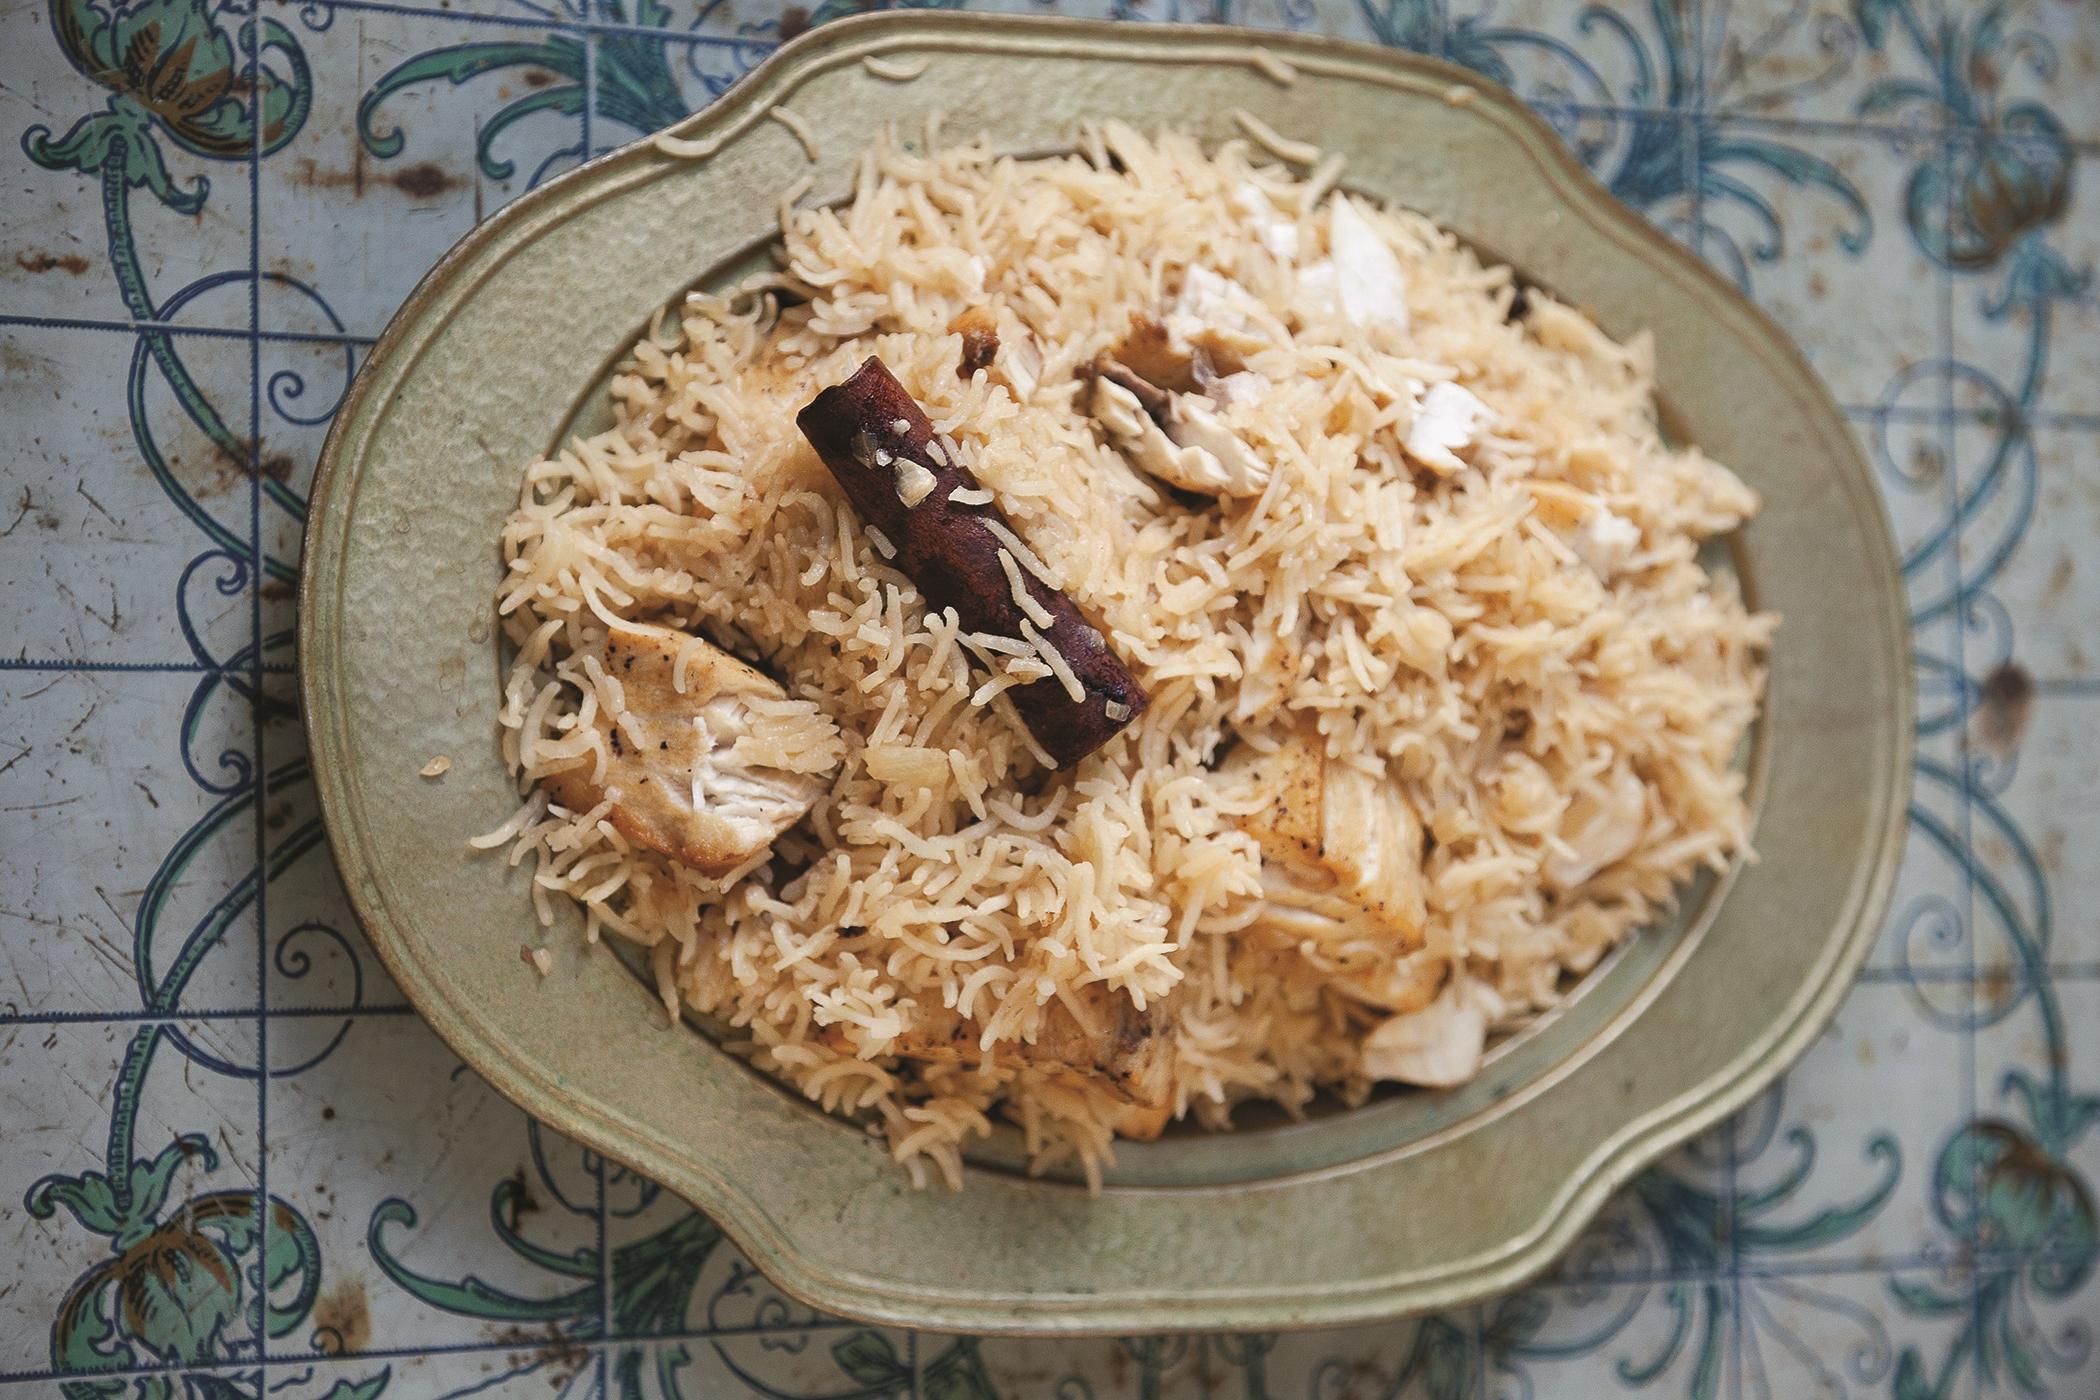 Sayadiyah (Salalah-Style Seared Fish in Rice)